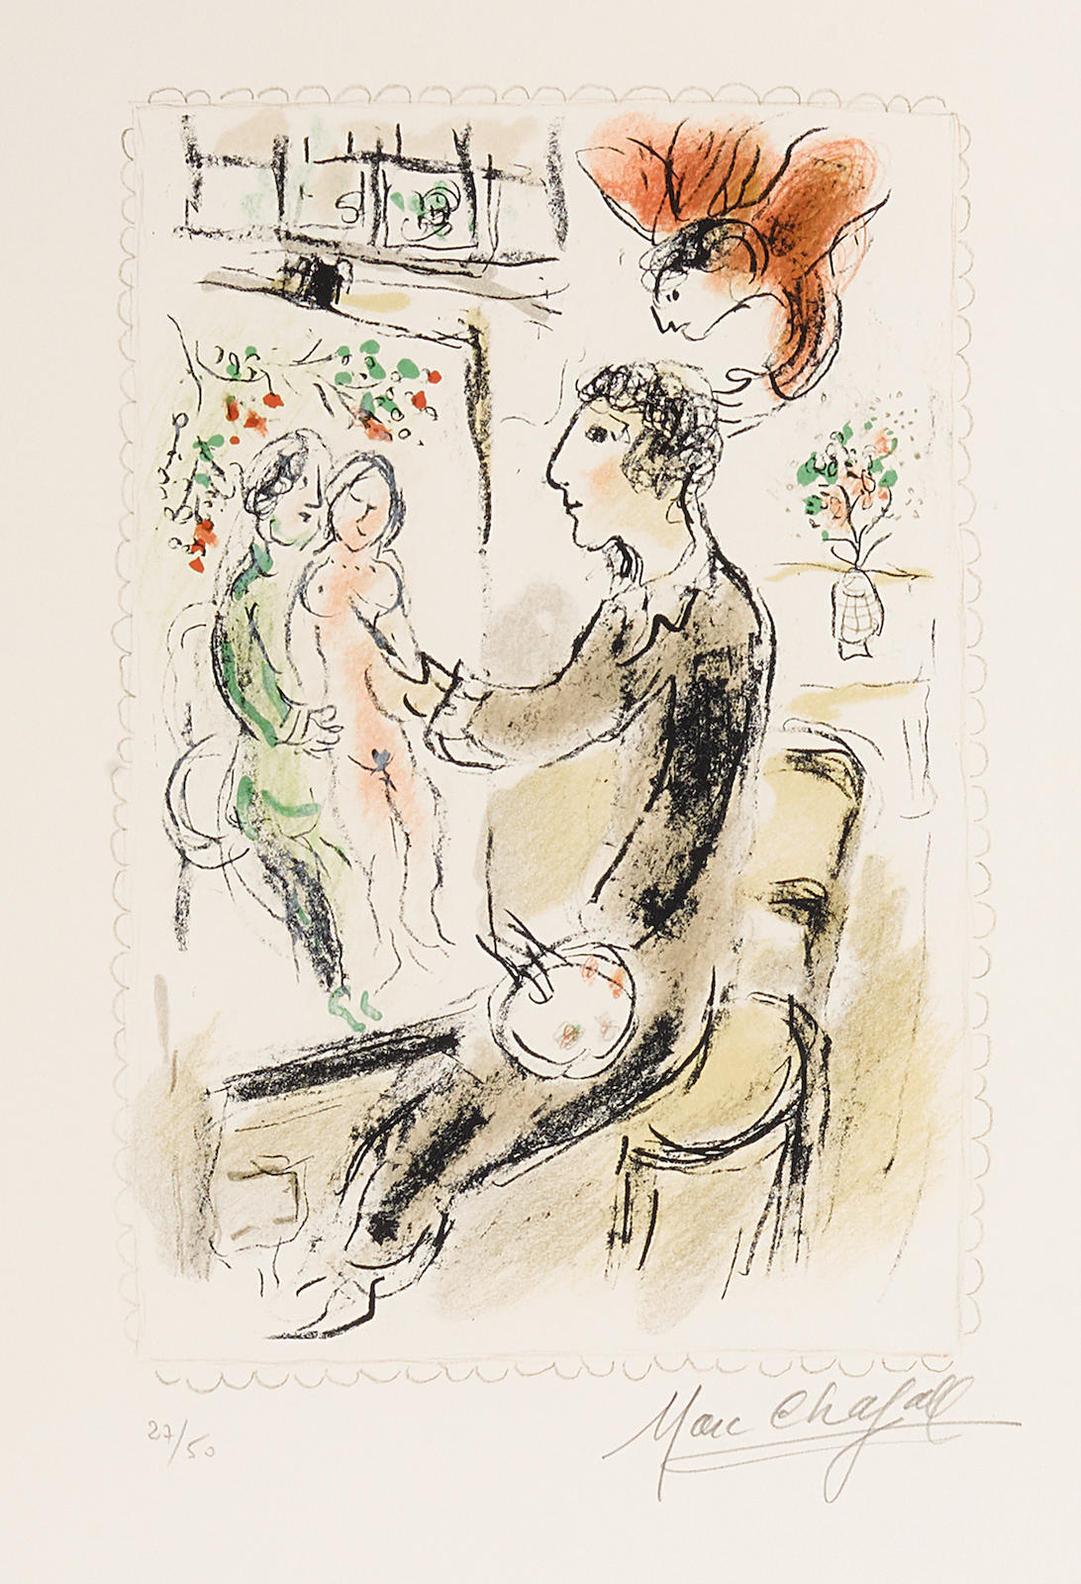 Marc Chagall-Le Peintre Blue-1980